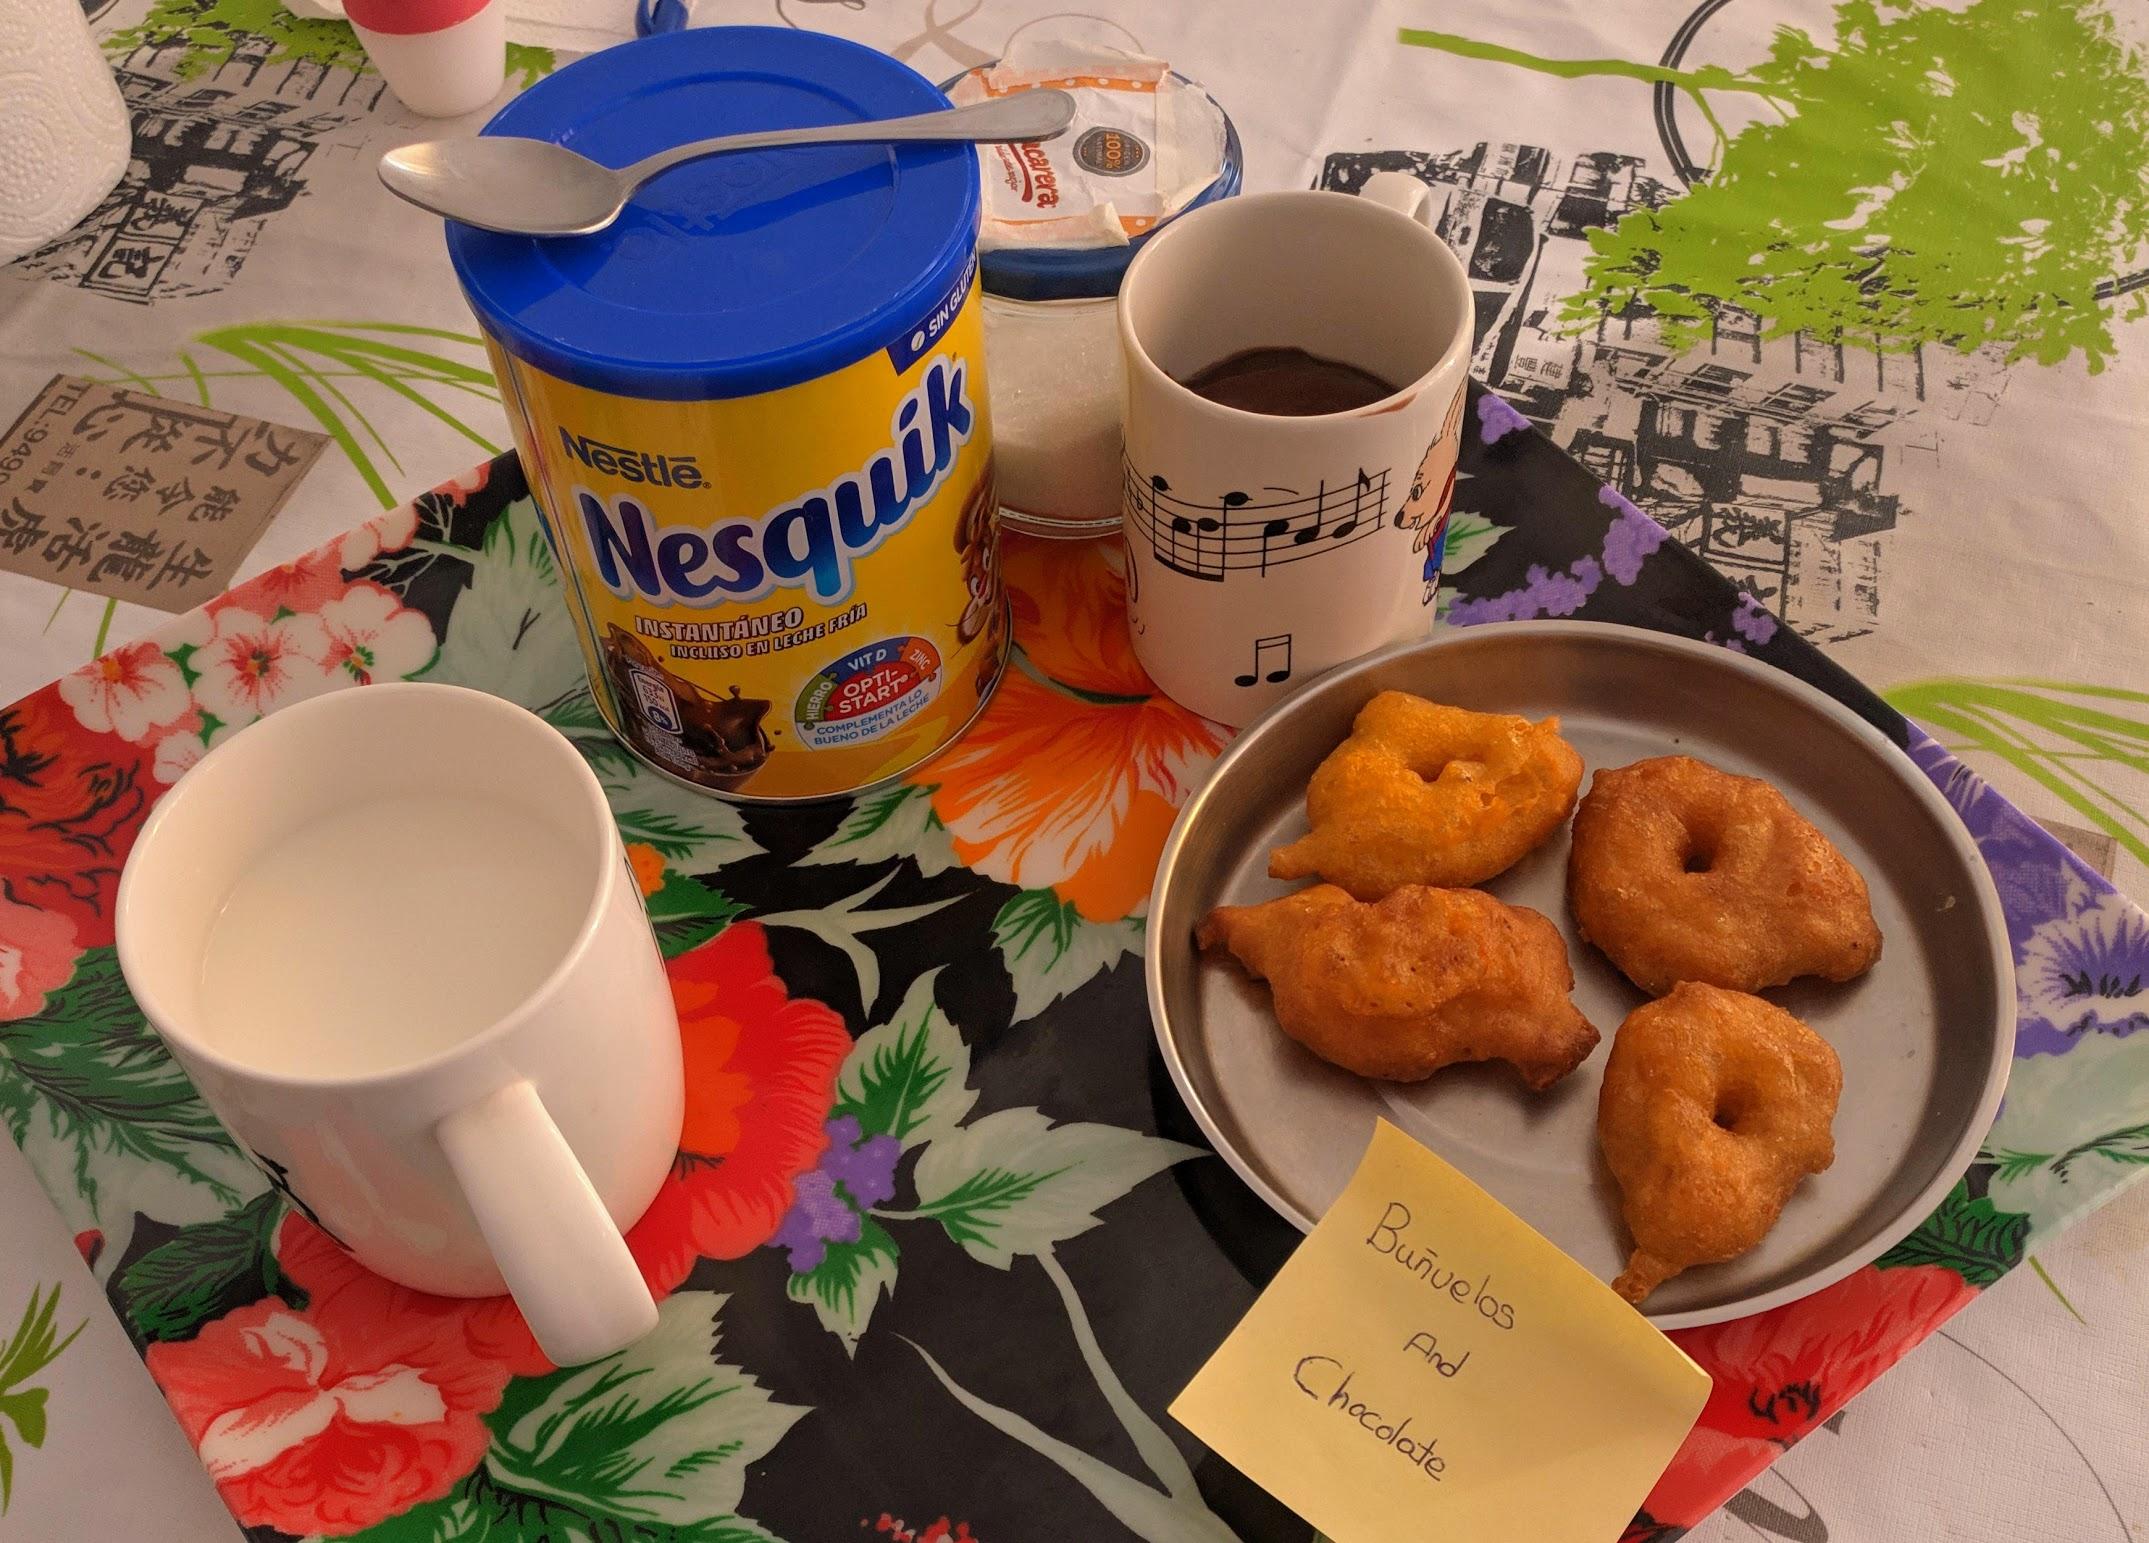 https://madrid.mattrossman.com/img/03/17/breakfast-1.jpg not found